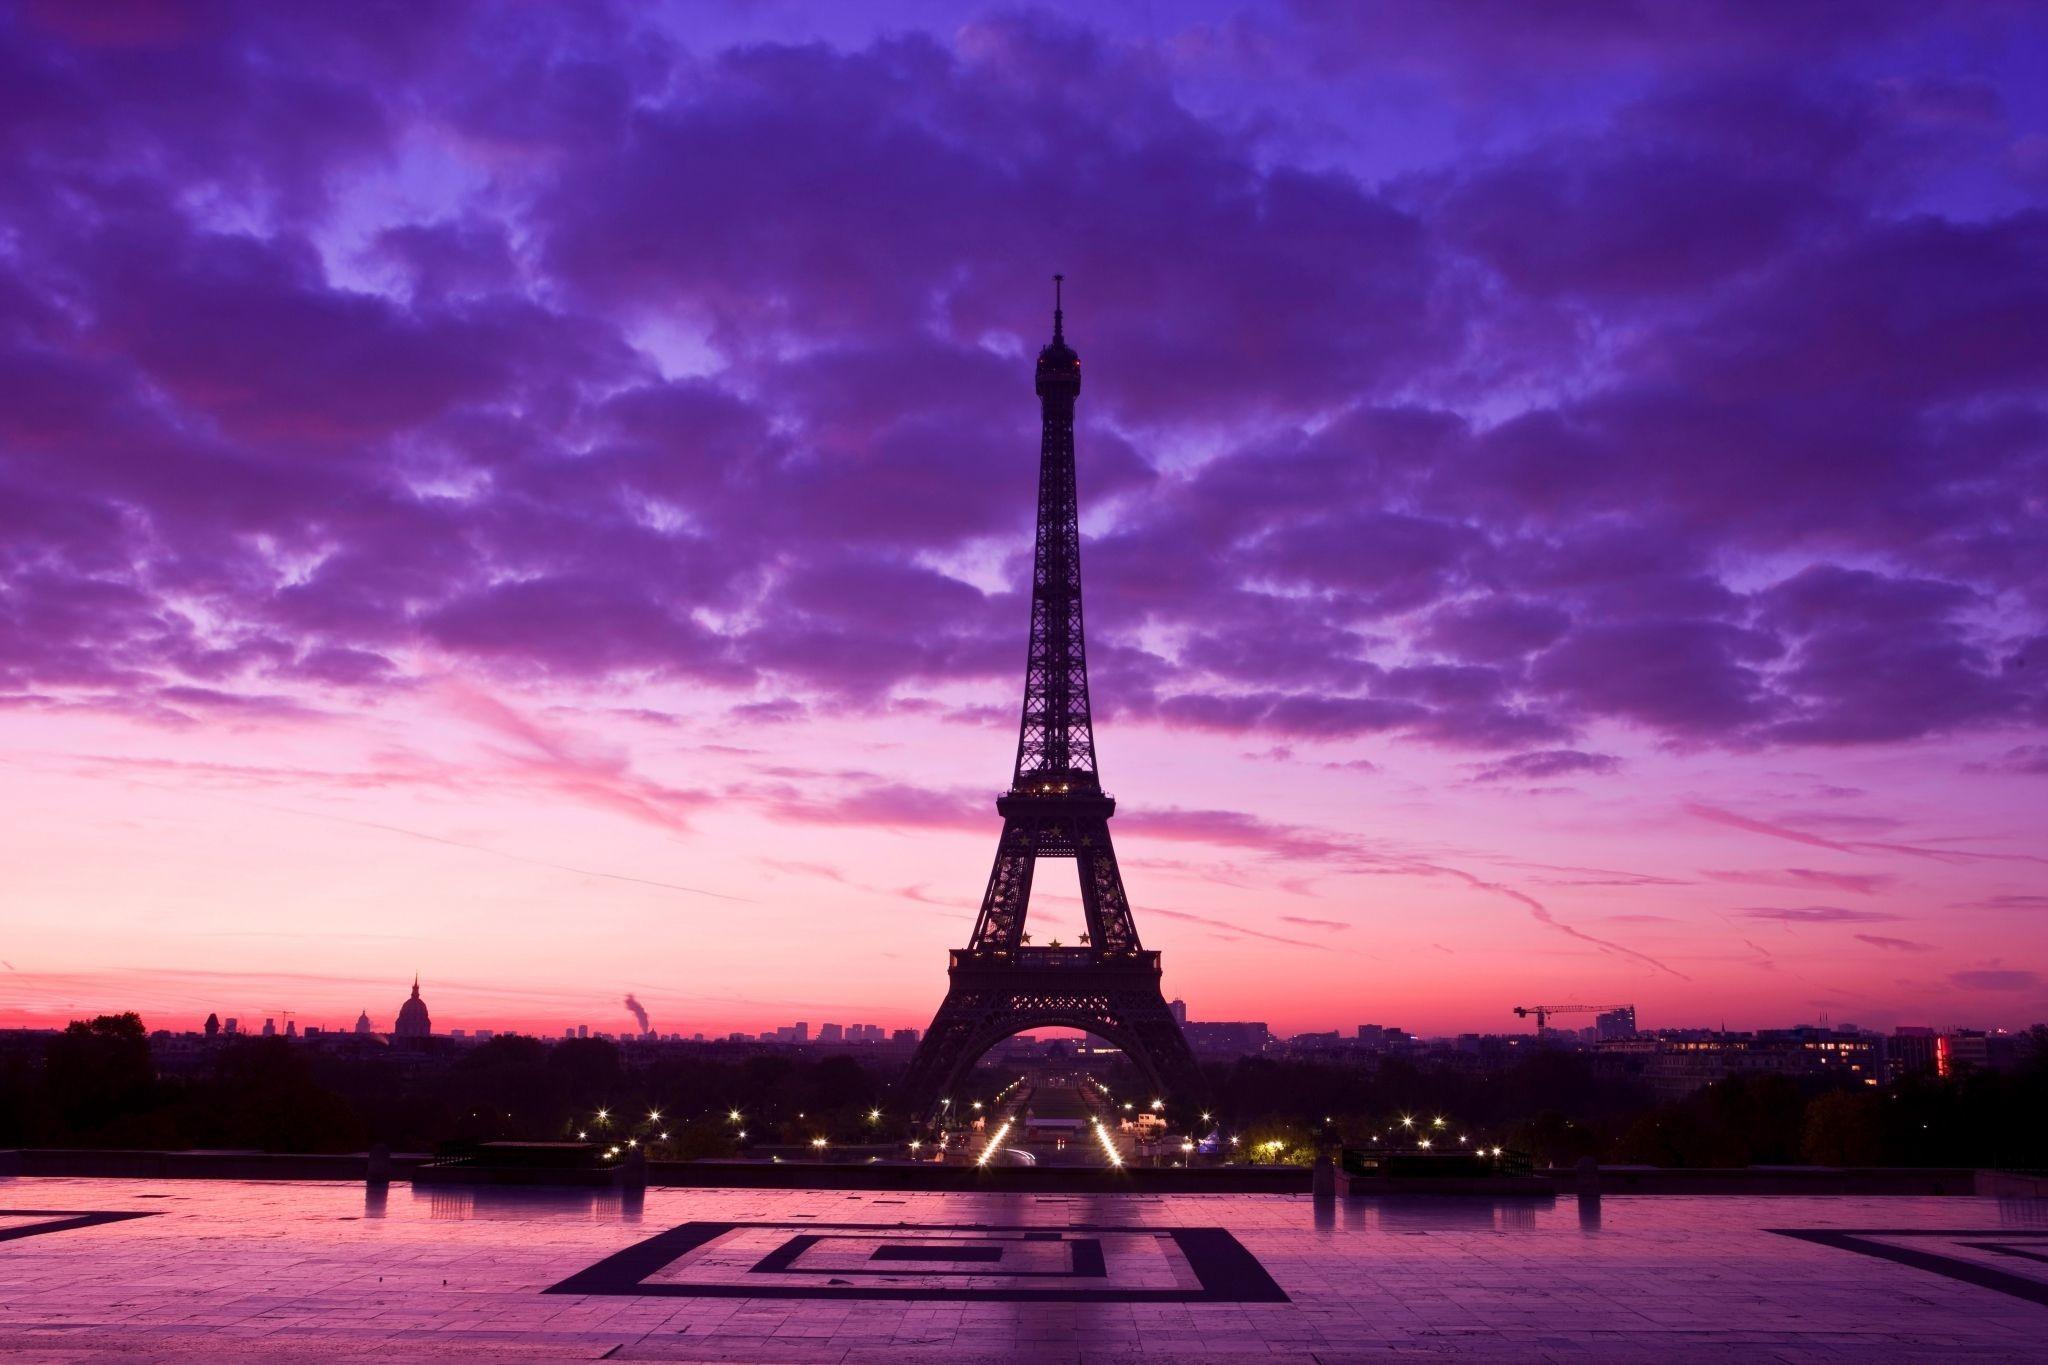 Pink Wallpaper Iphone Eiffel Tower